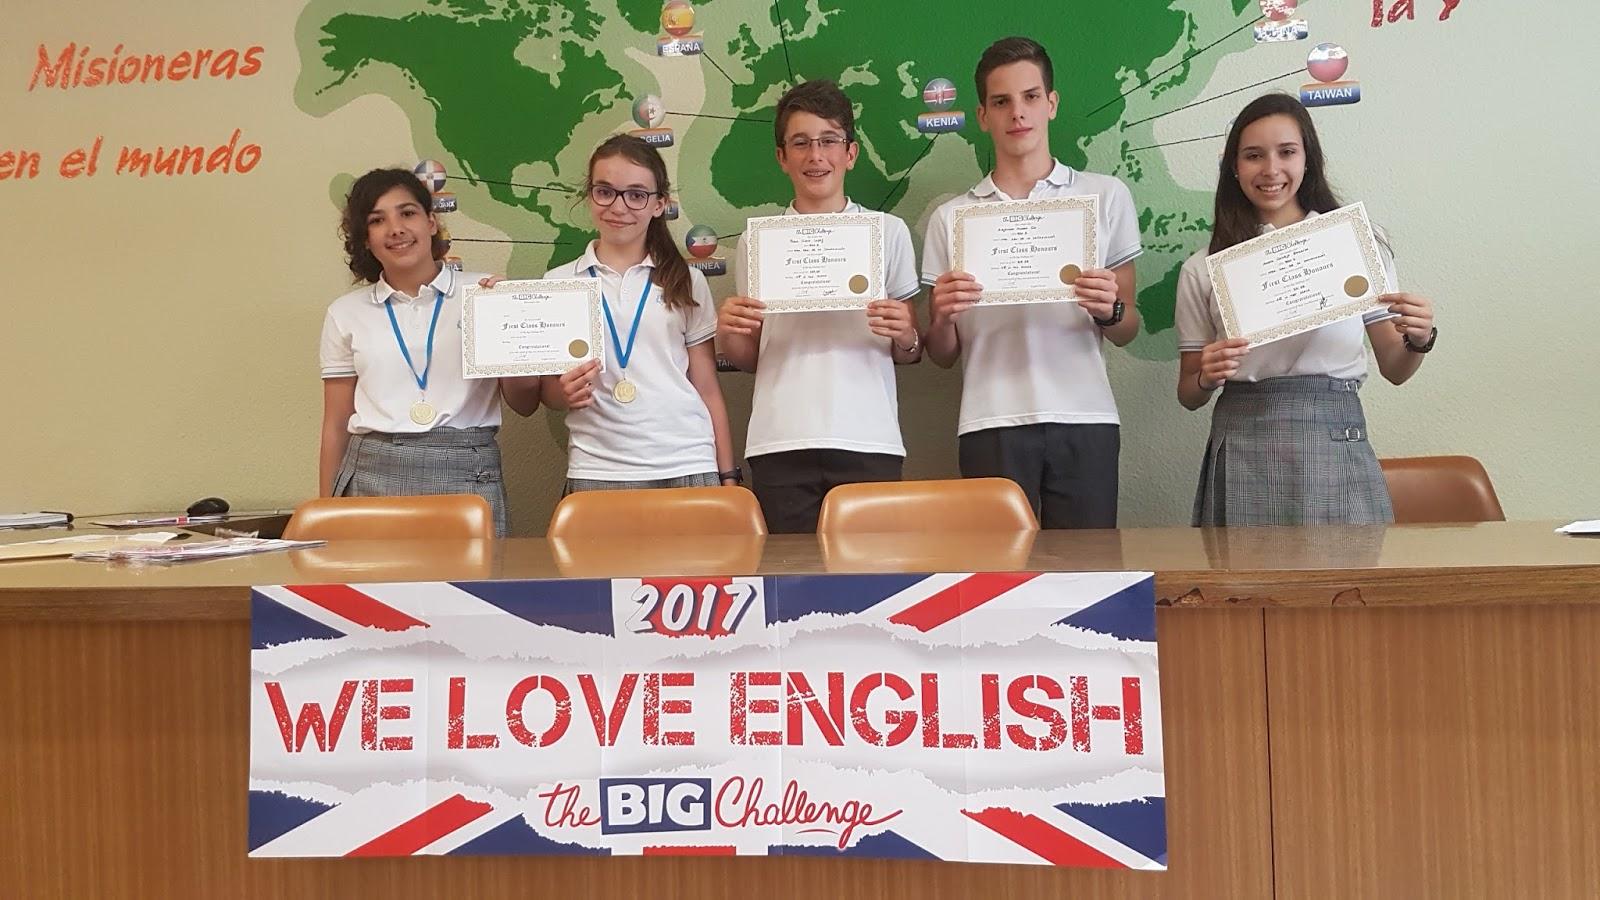 Agustinas Valladolid - 2017 - Ingles - The Big Challege